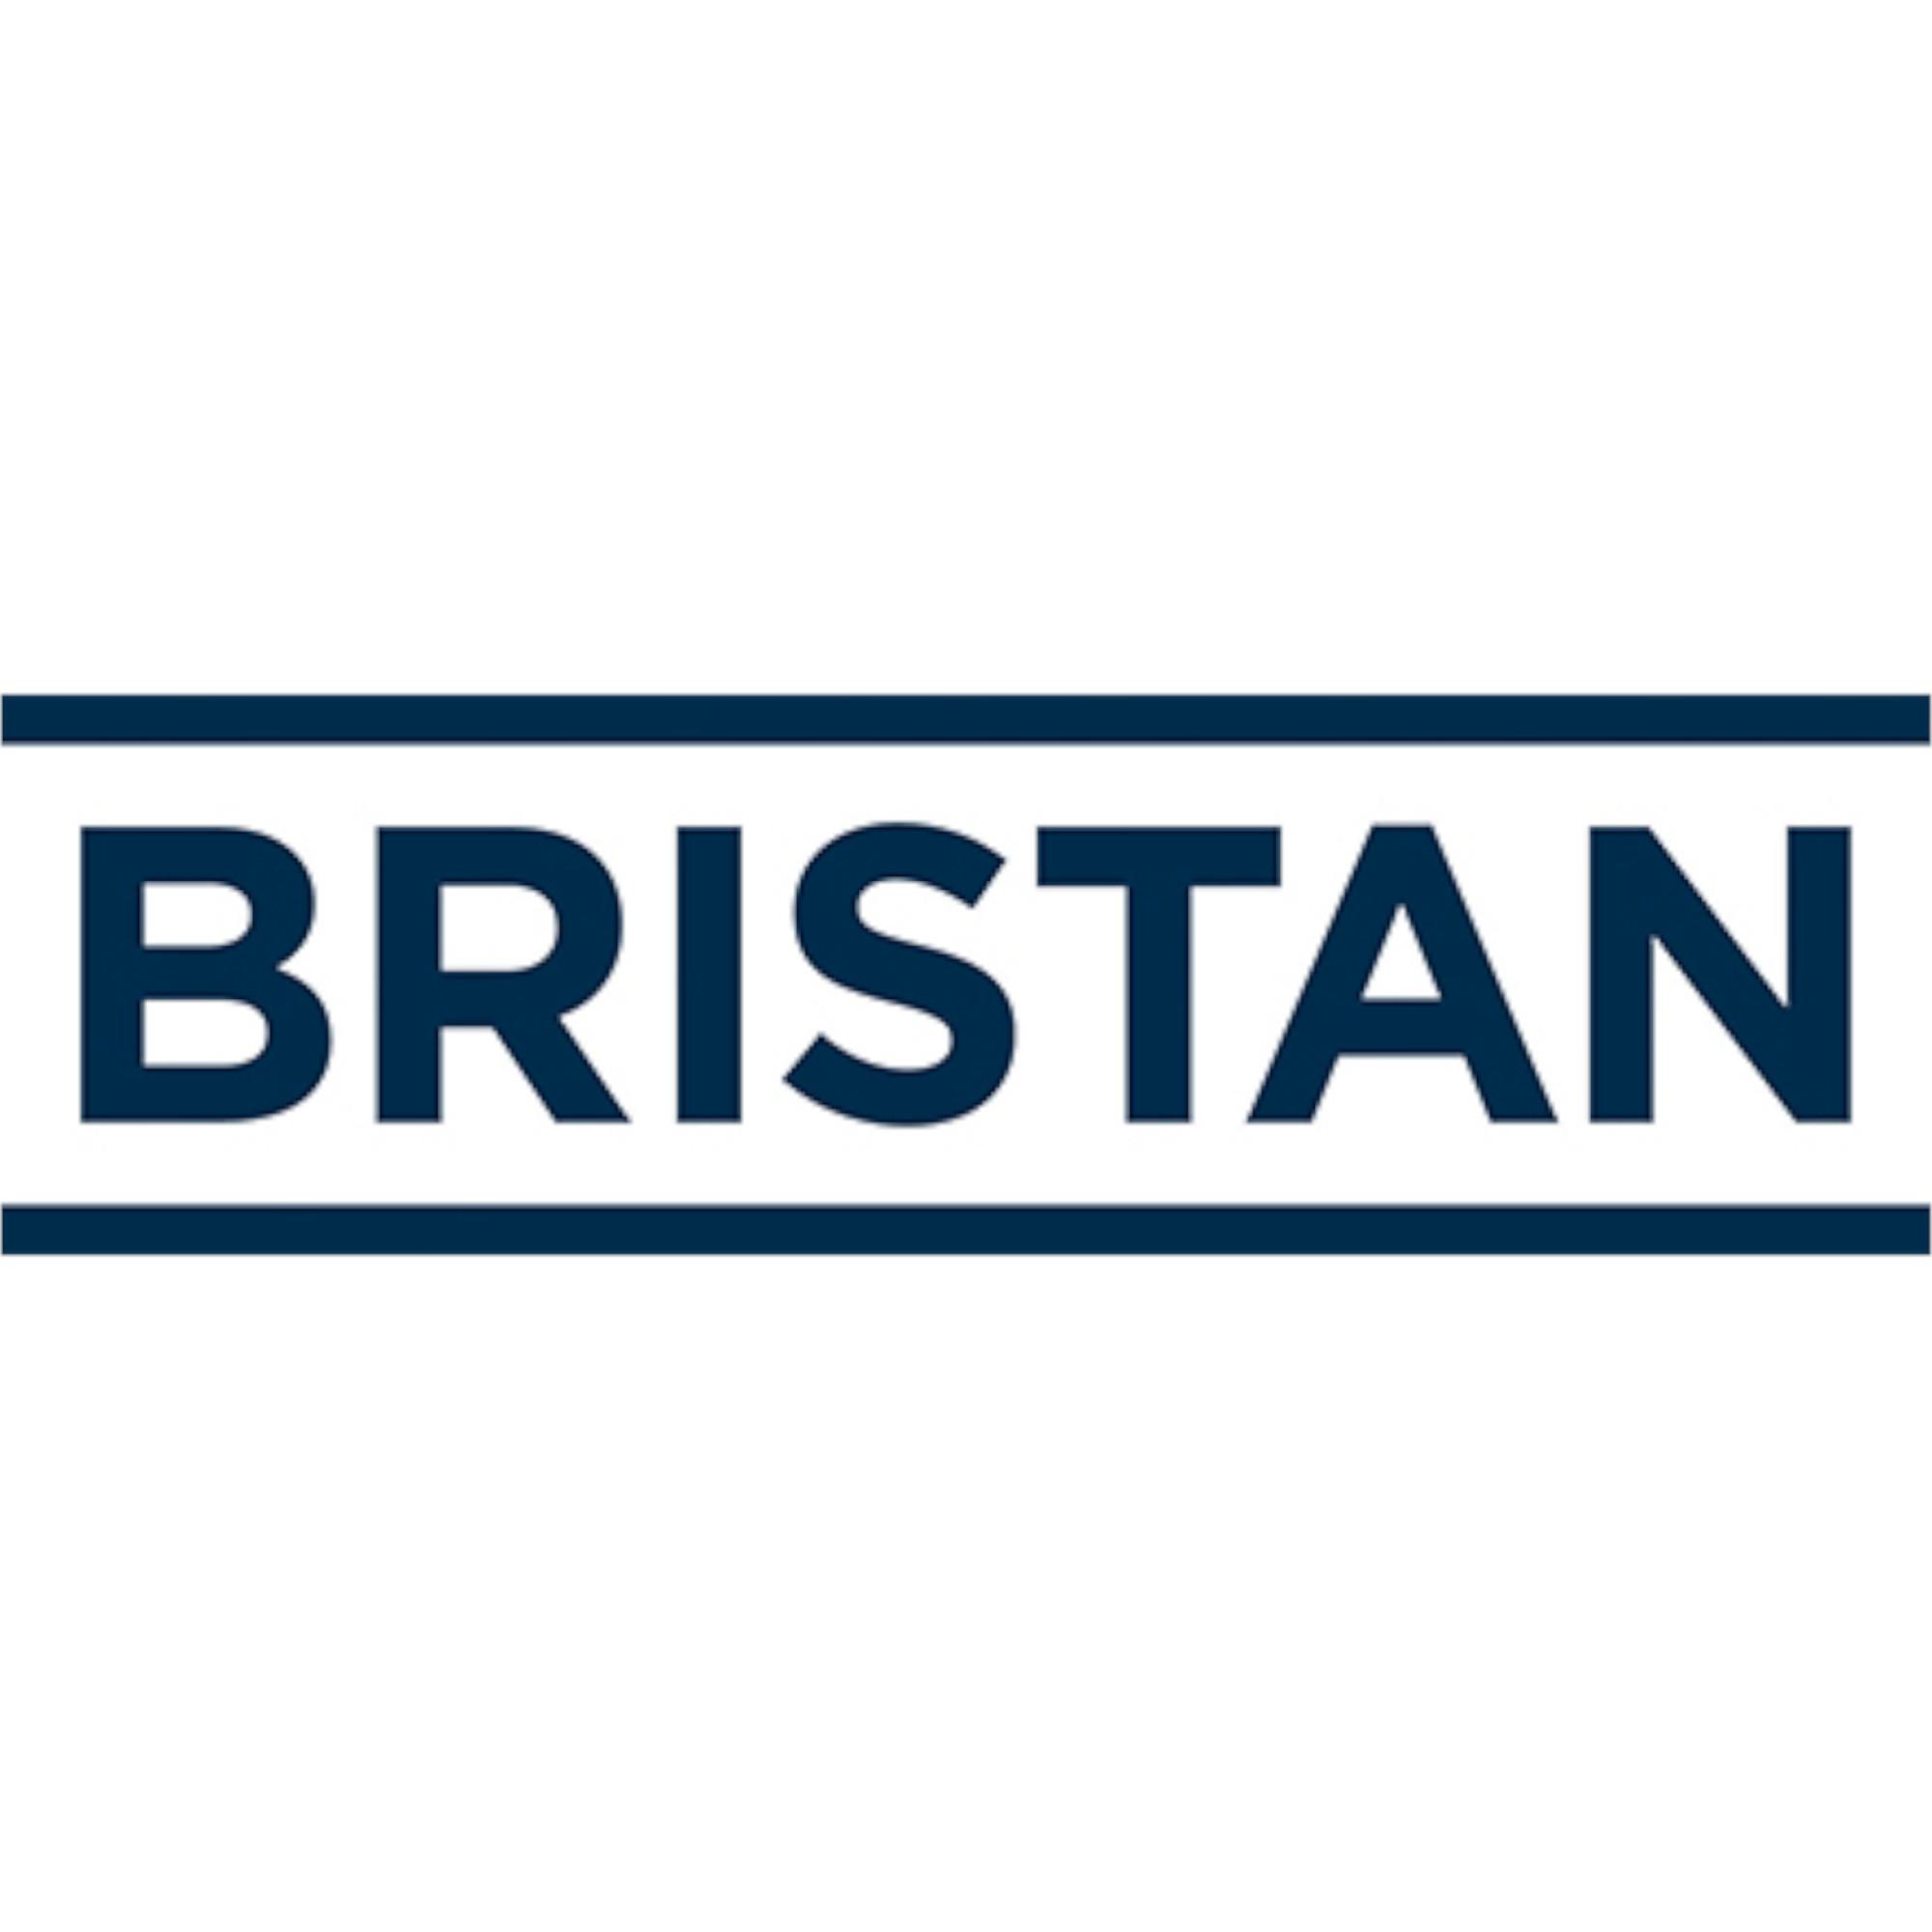 Bristan Brand Image